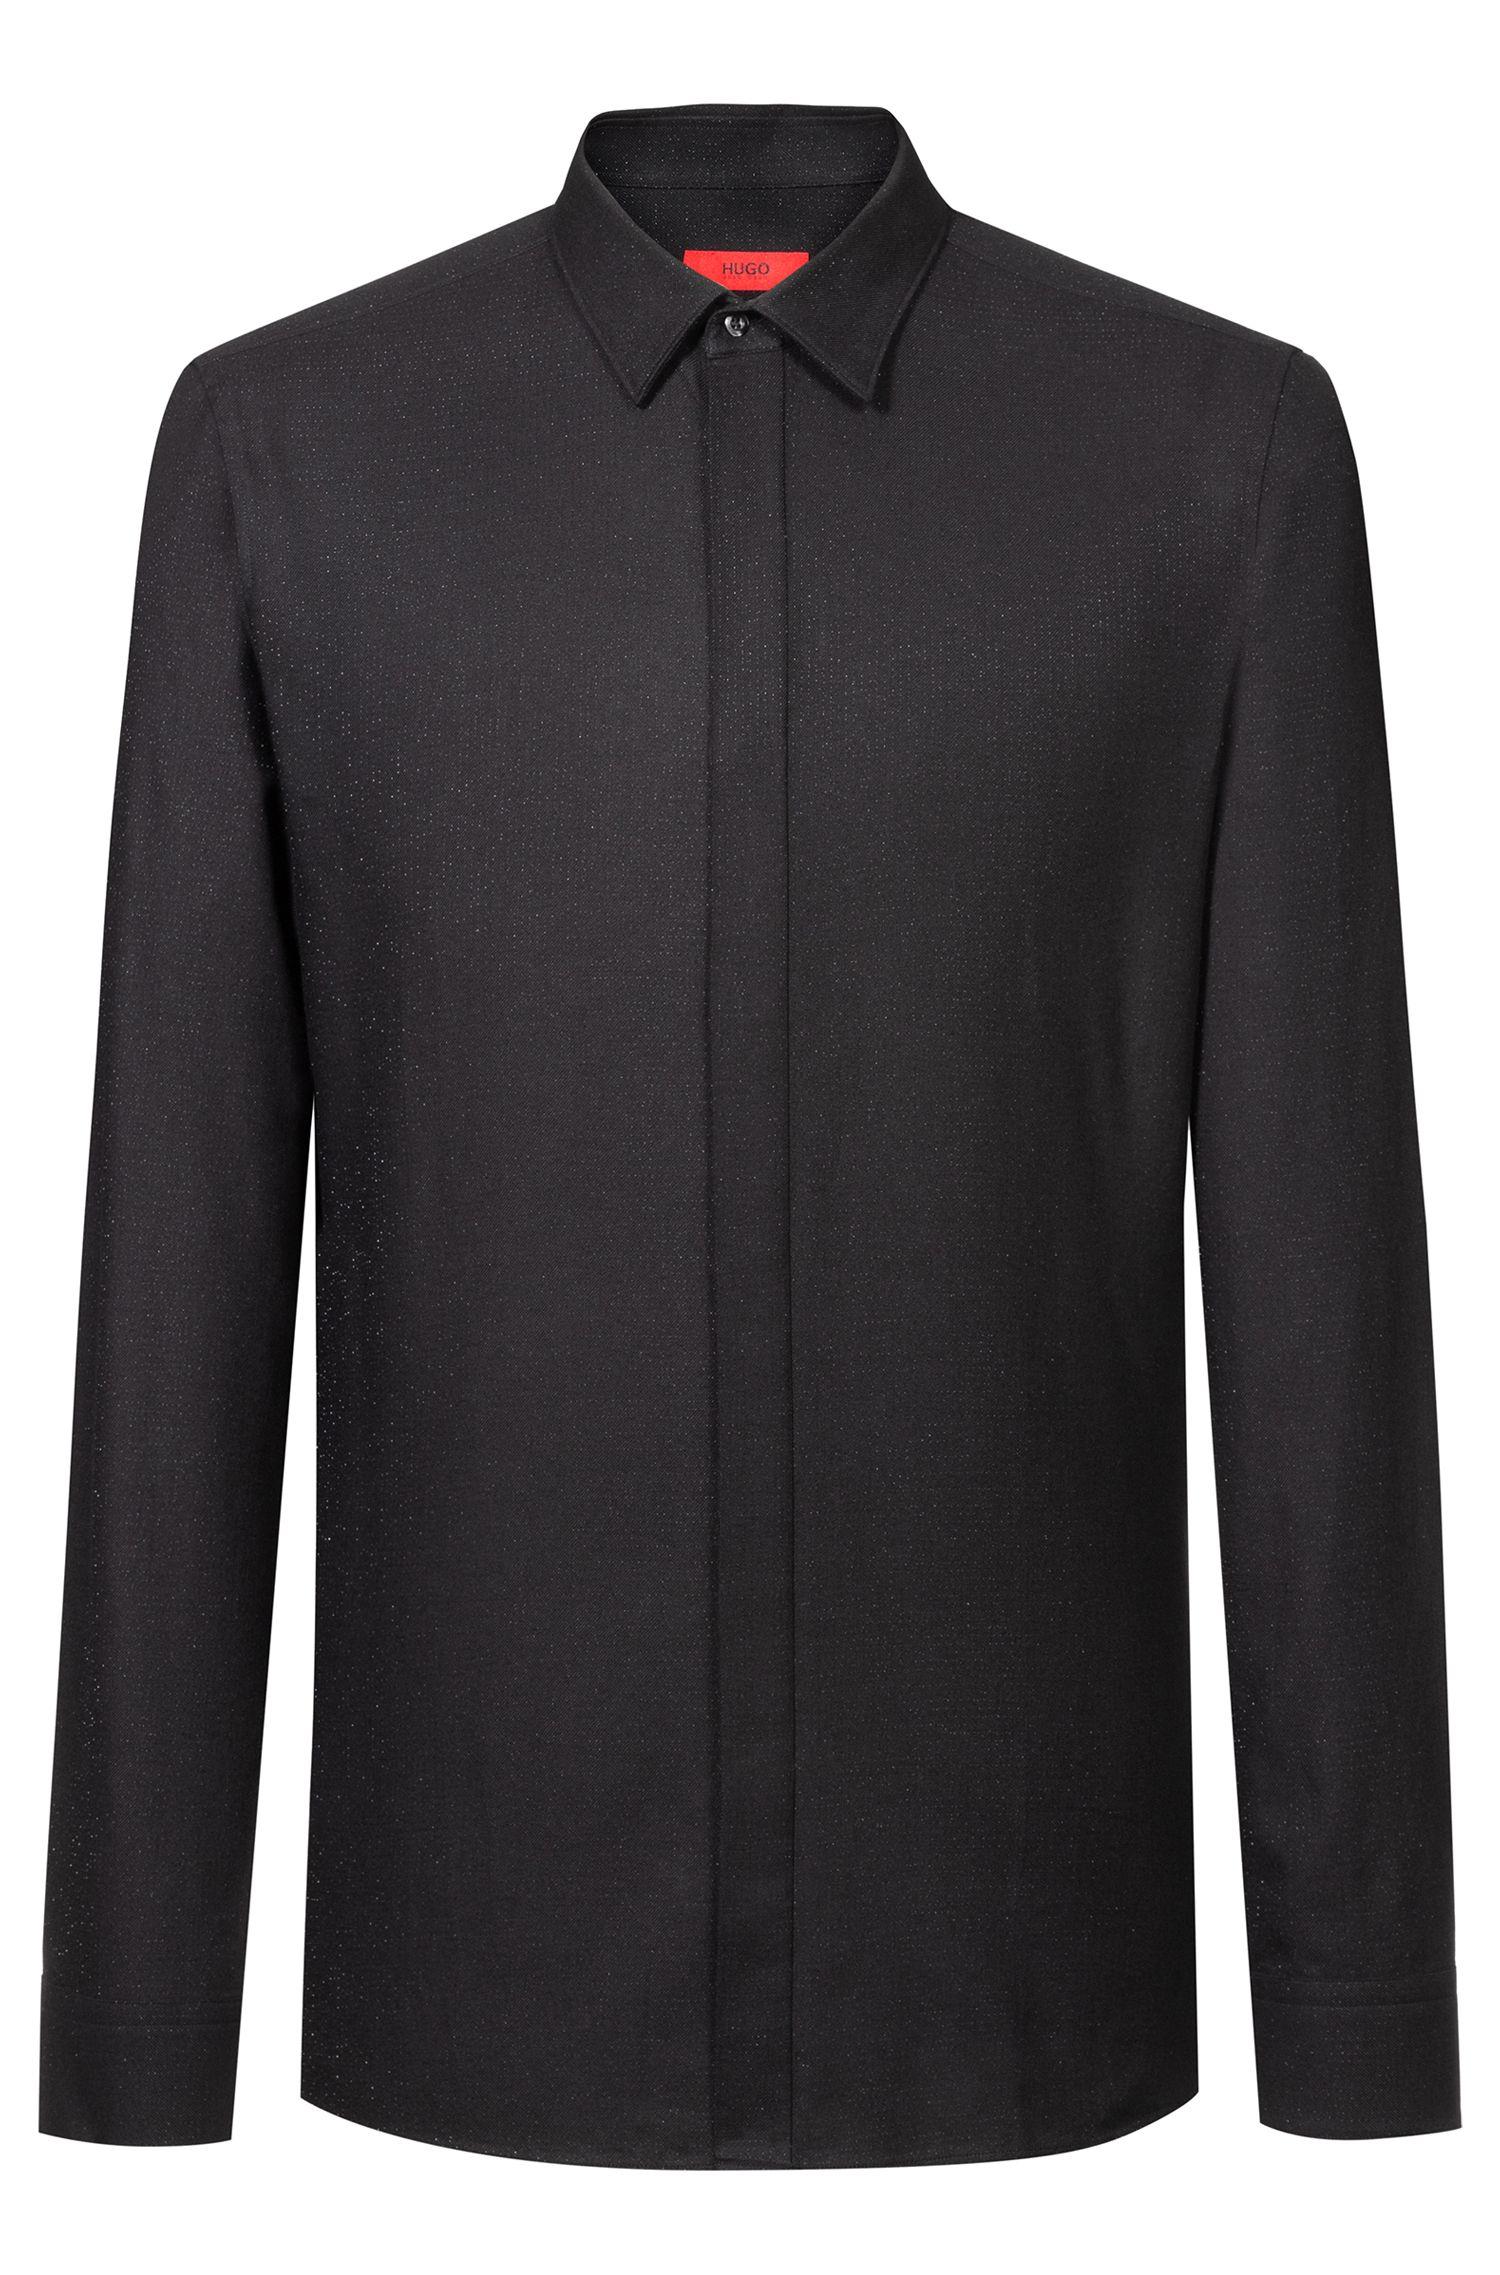 Extra-slim-fit shirt in cotton-blend metallic yarn, Black